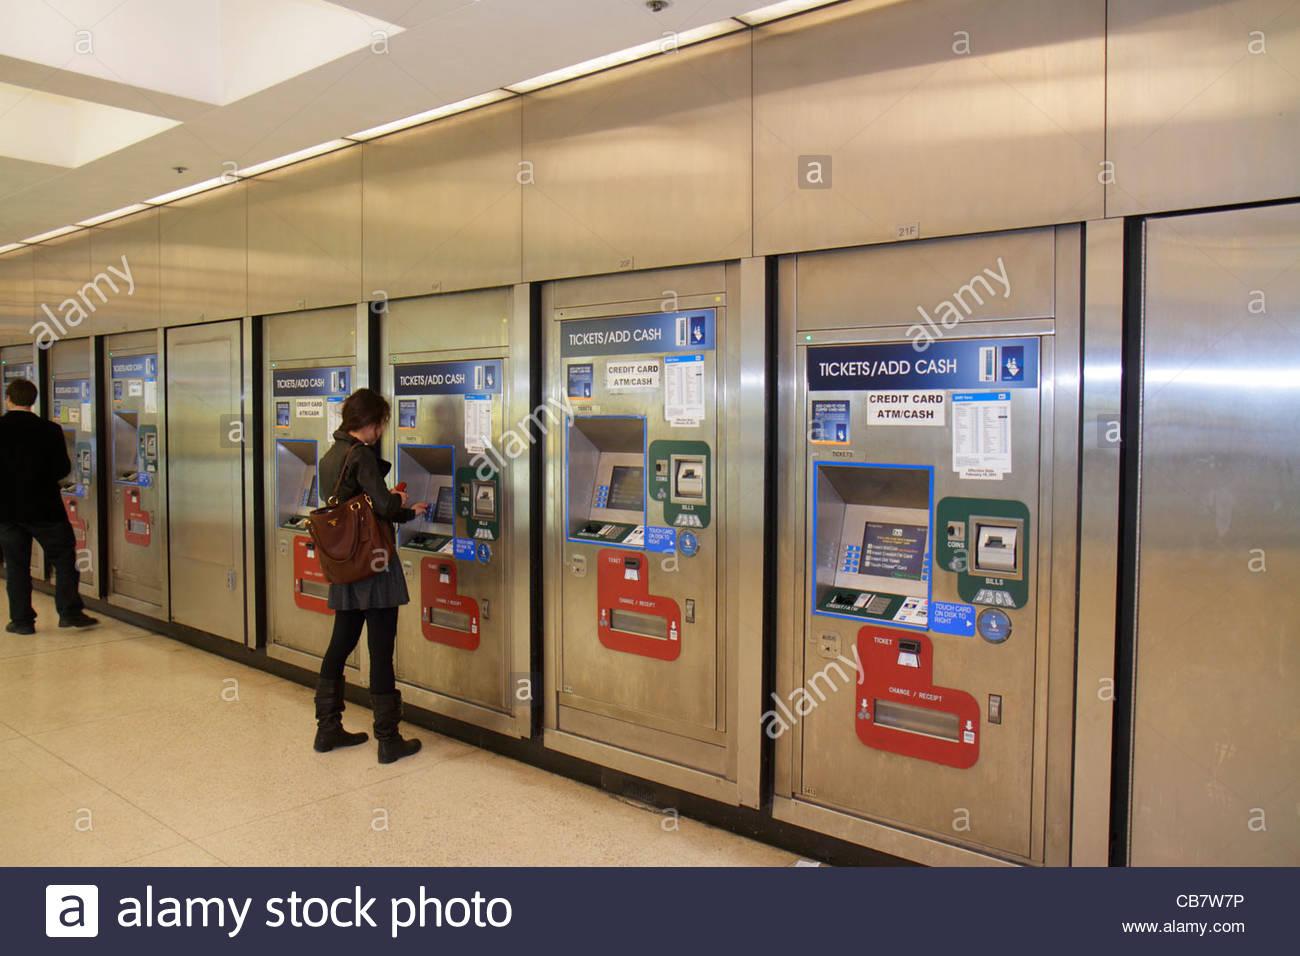 San Francisco California Market Street BART Montgomery Station mass transit public transportation ticket machine - Stock Image